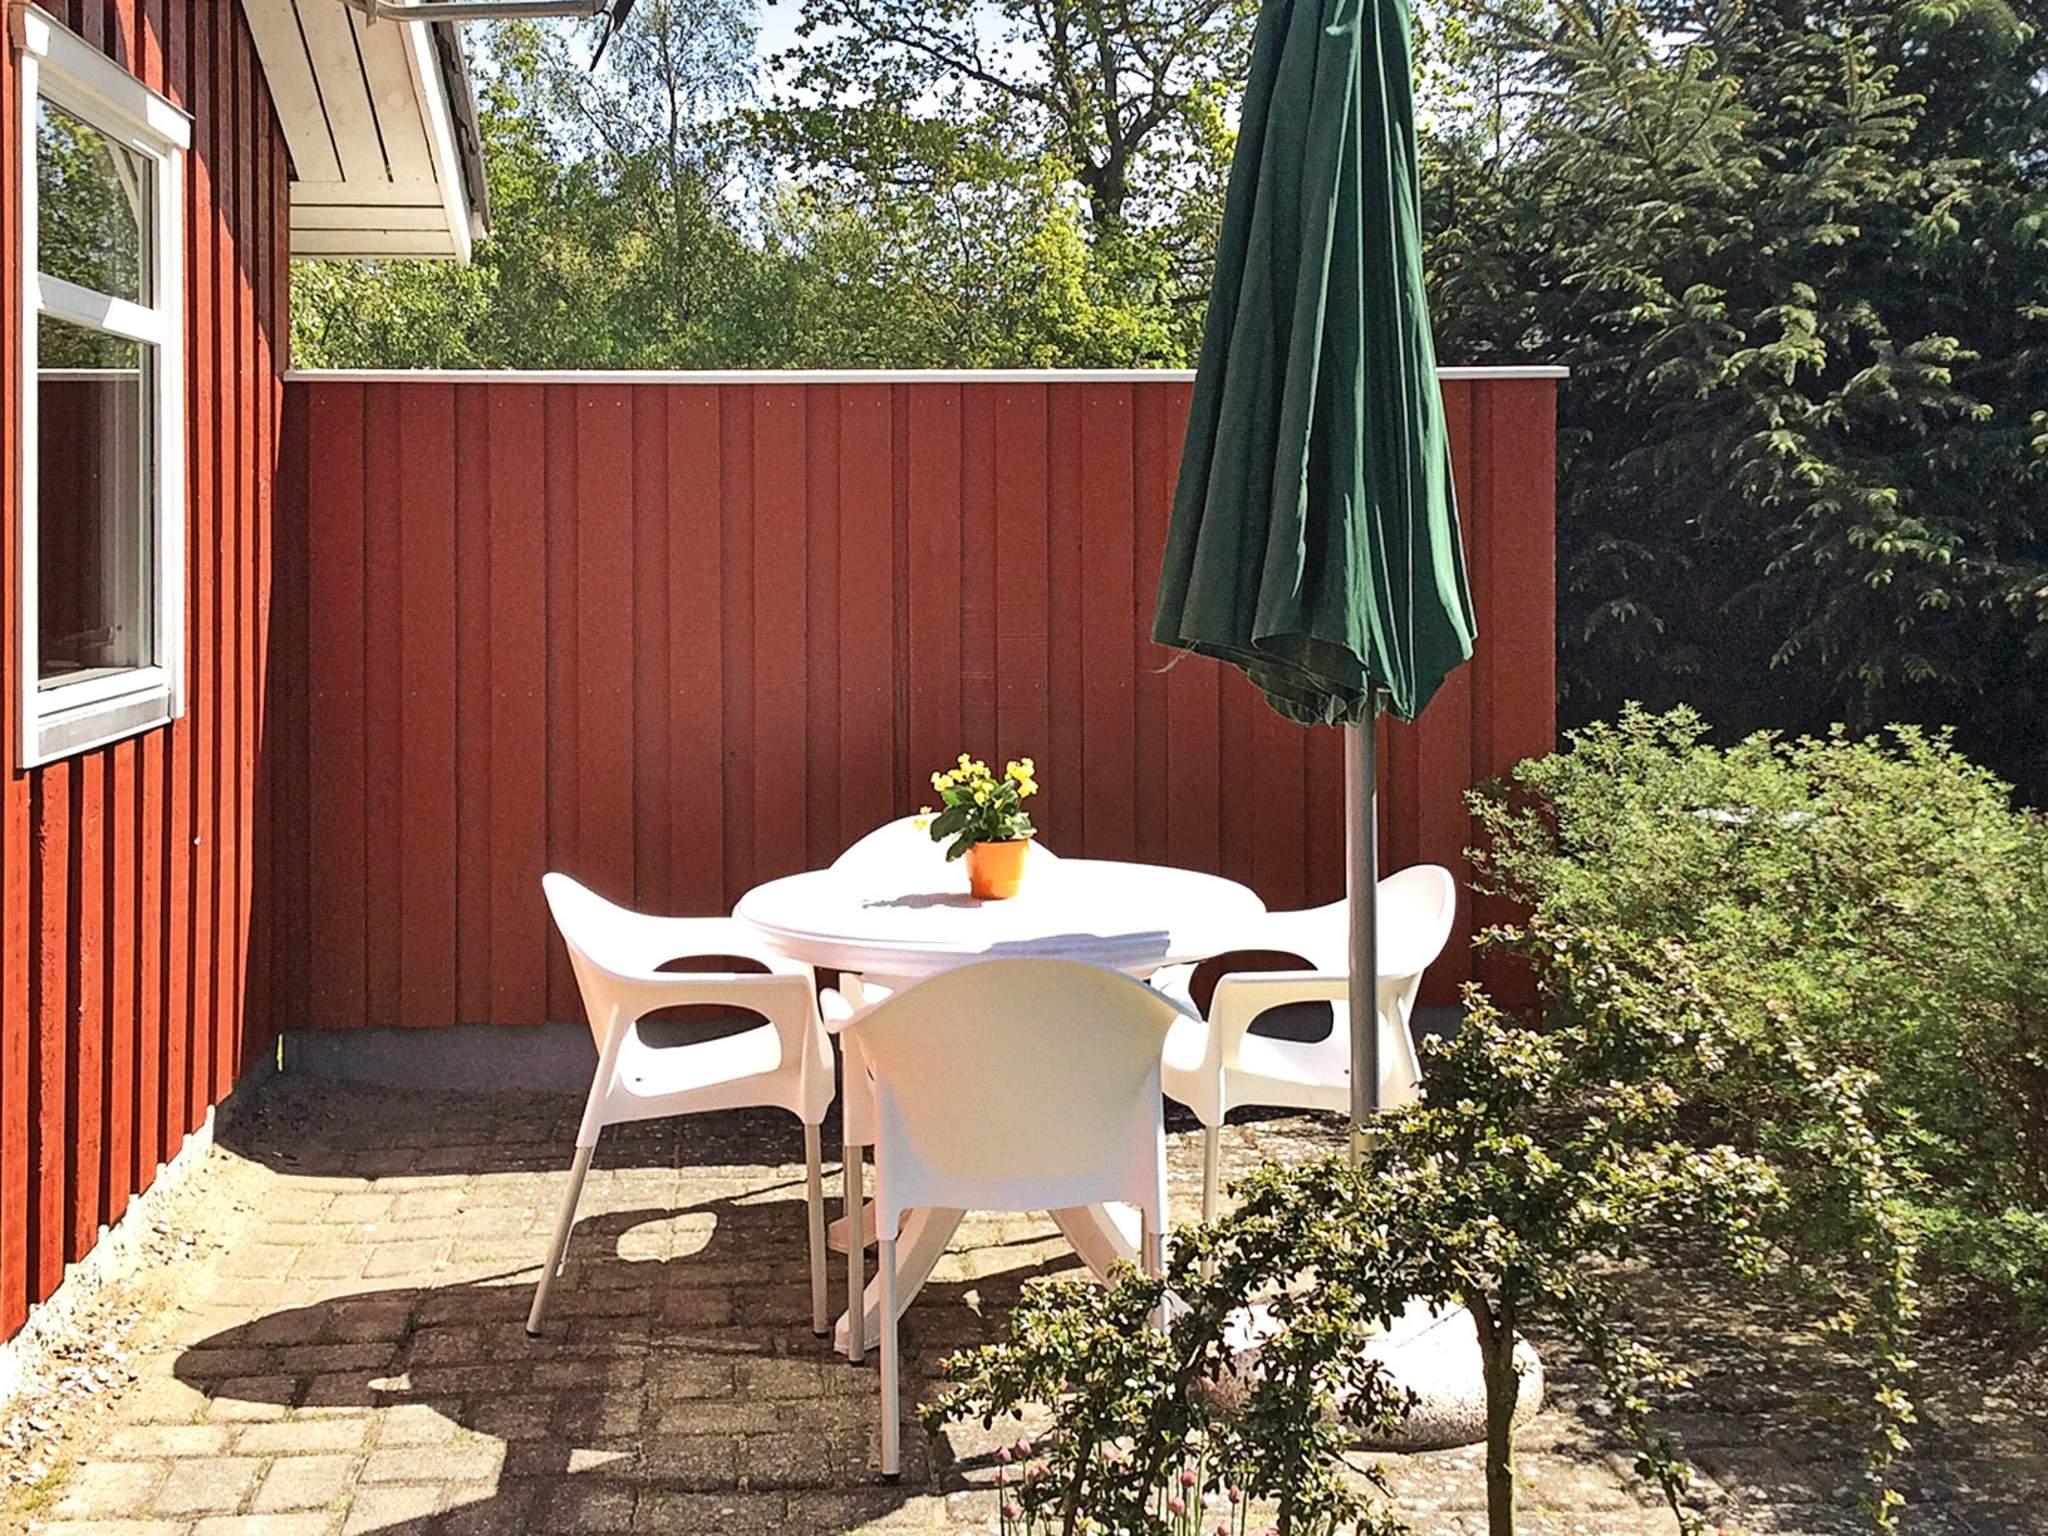 Ferienhaus Øster Hurup (83254), Øster Hurup, , Dänische Ostsee, Dänemark, Bild 22